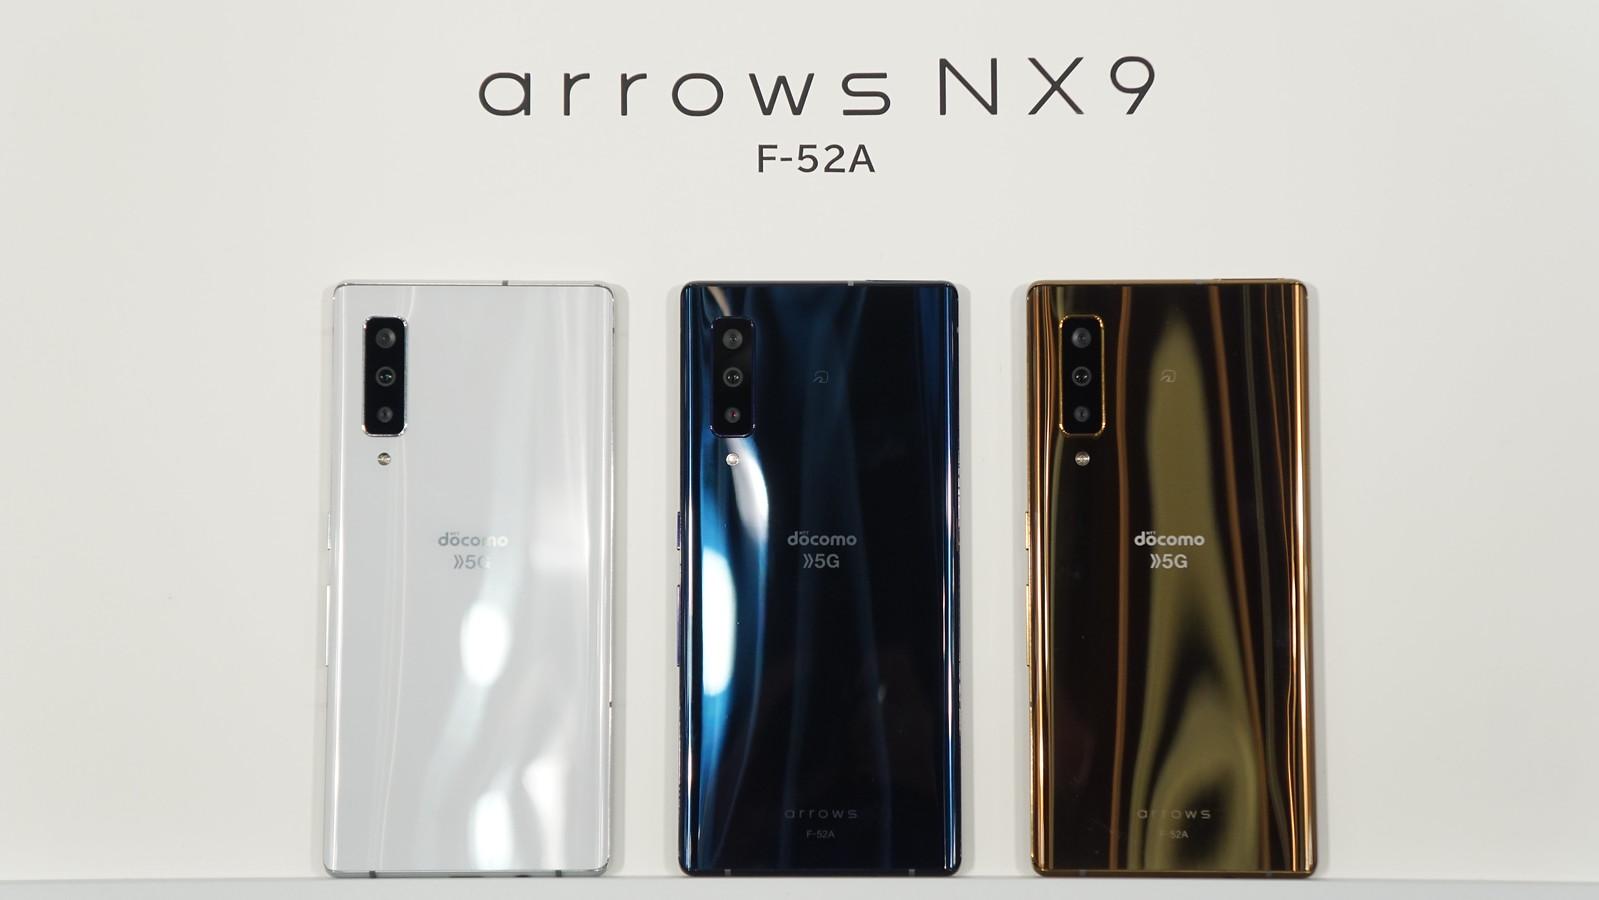 「arrows NX9」フォトレビュー